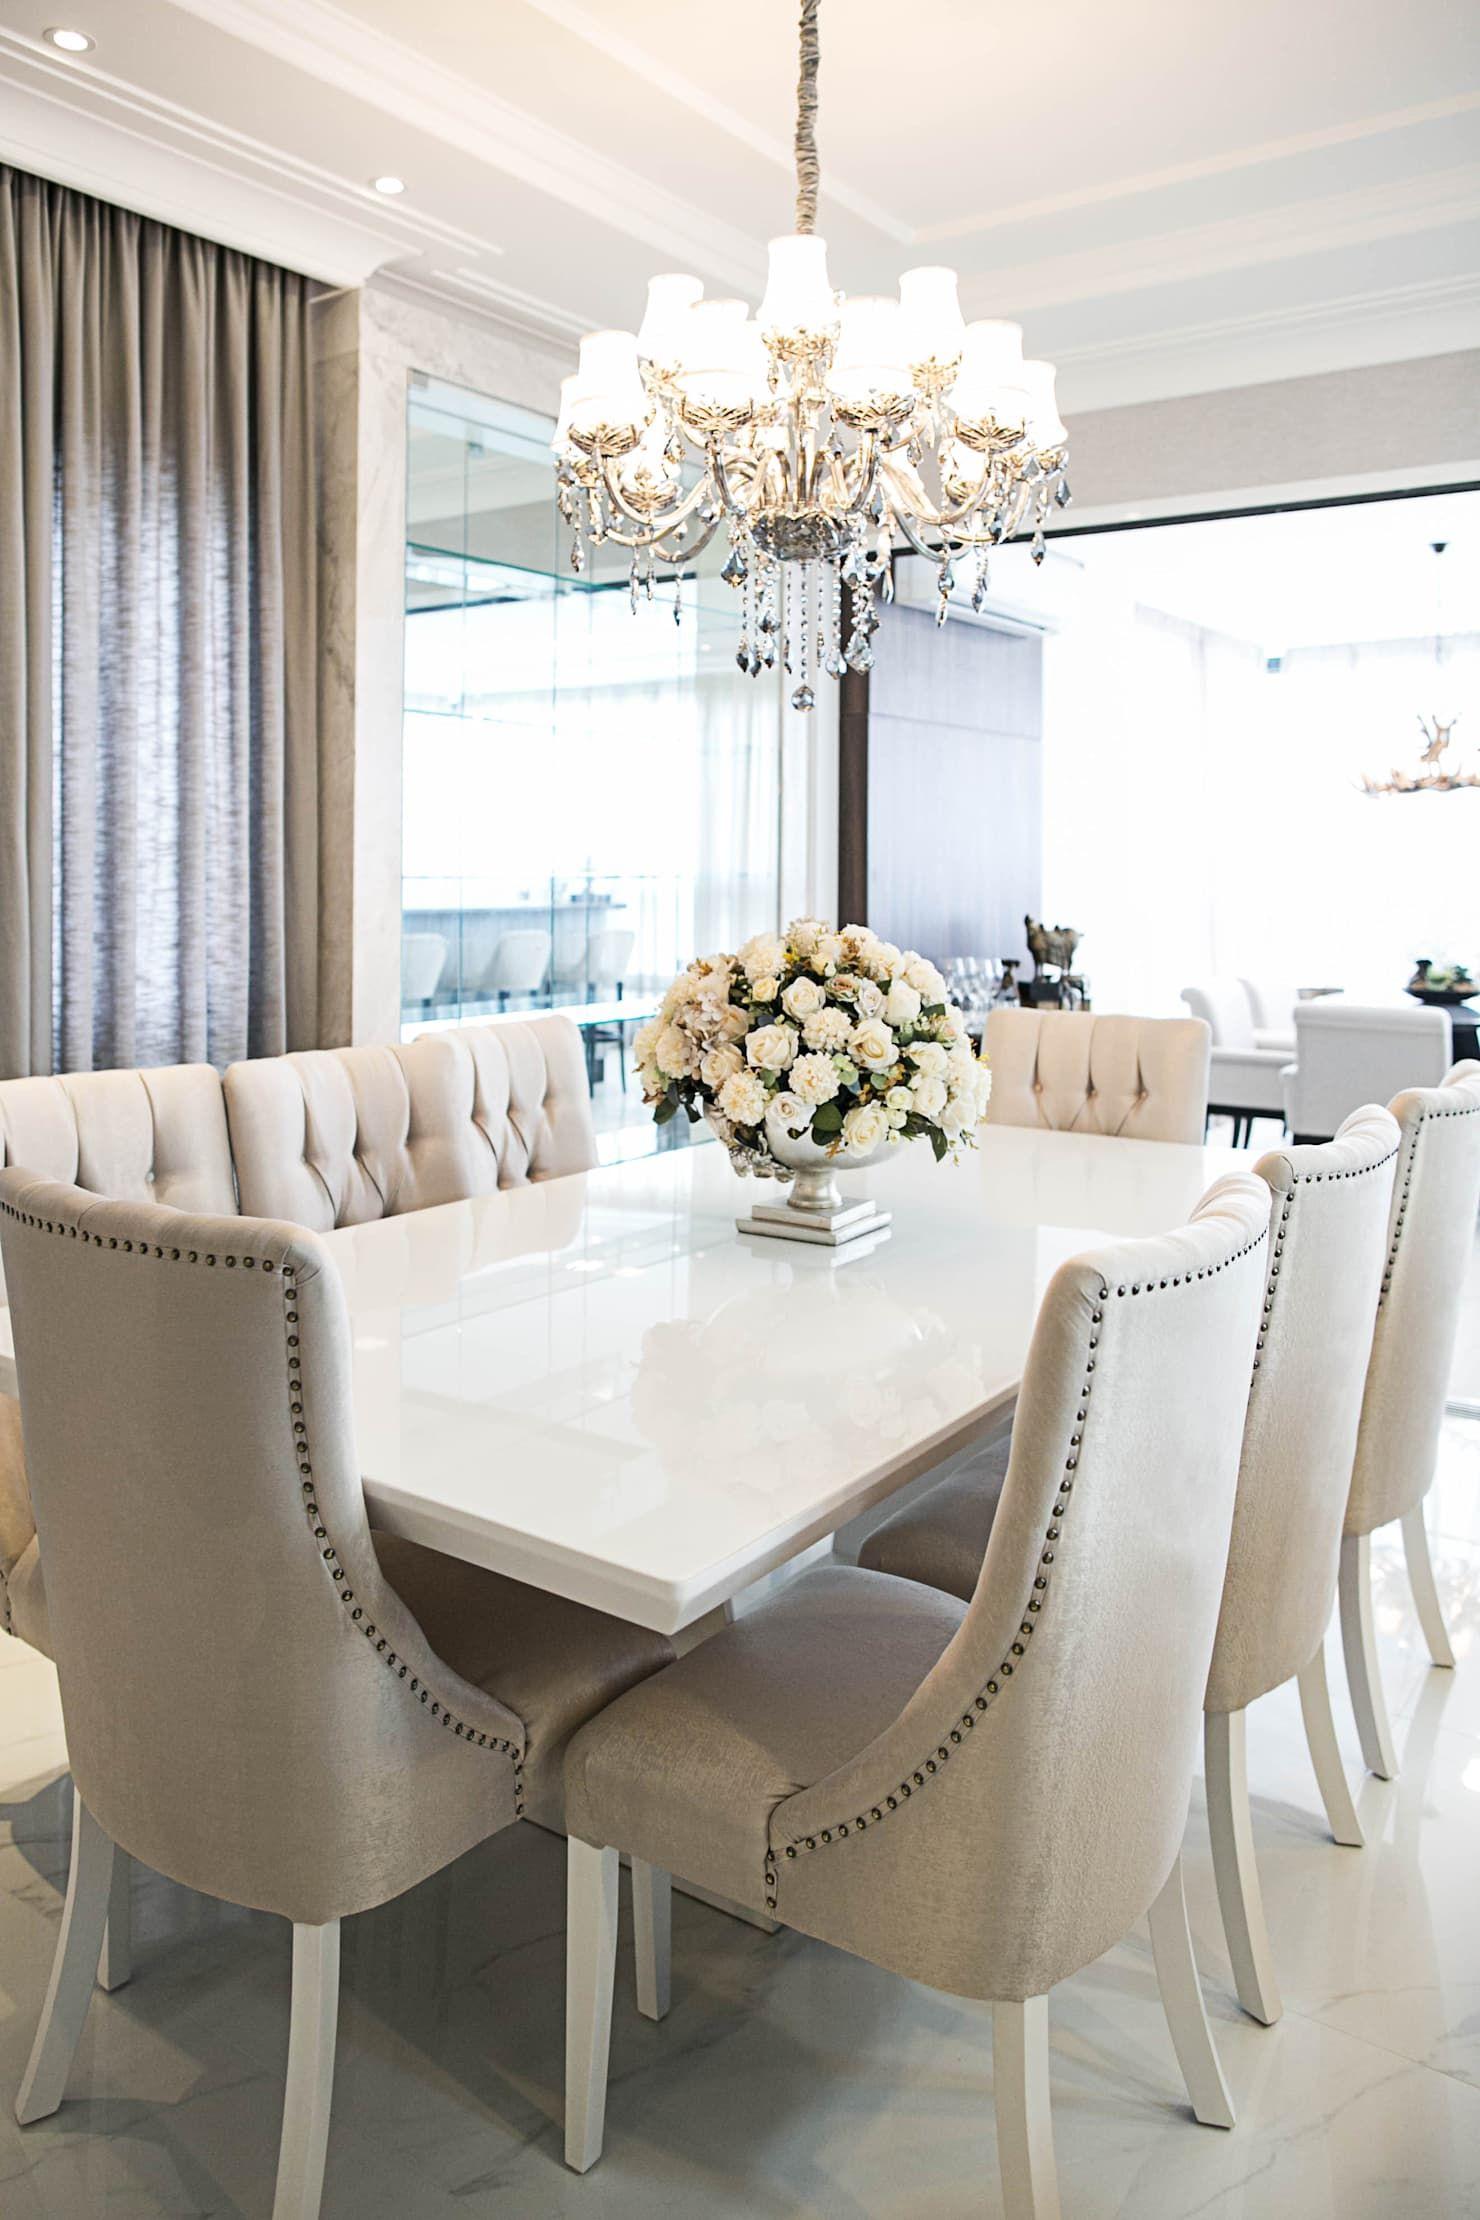 Photo of Sala de jantar abittare design salas de jantar clássicas | homify